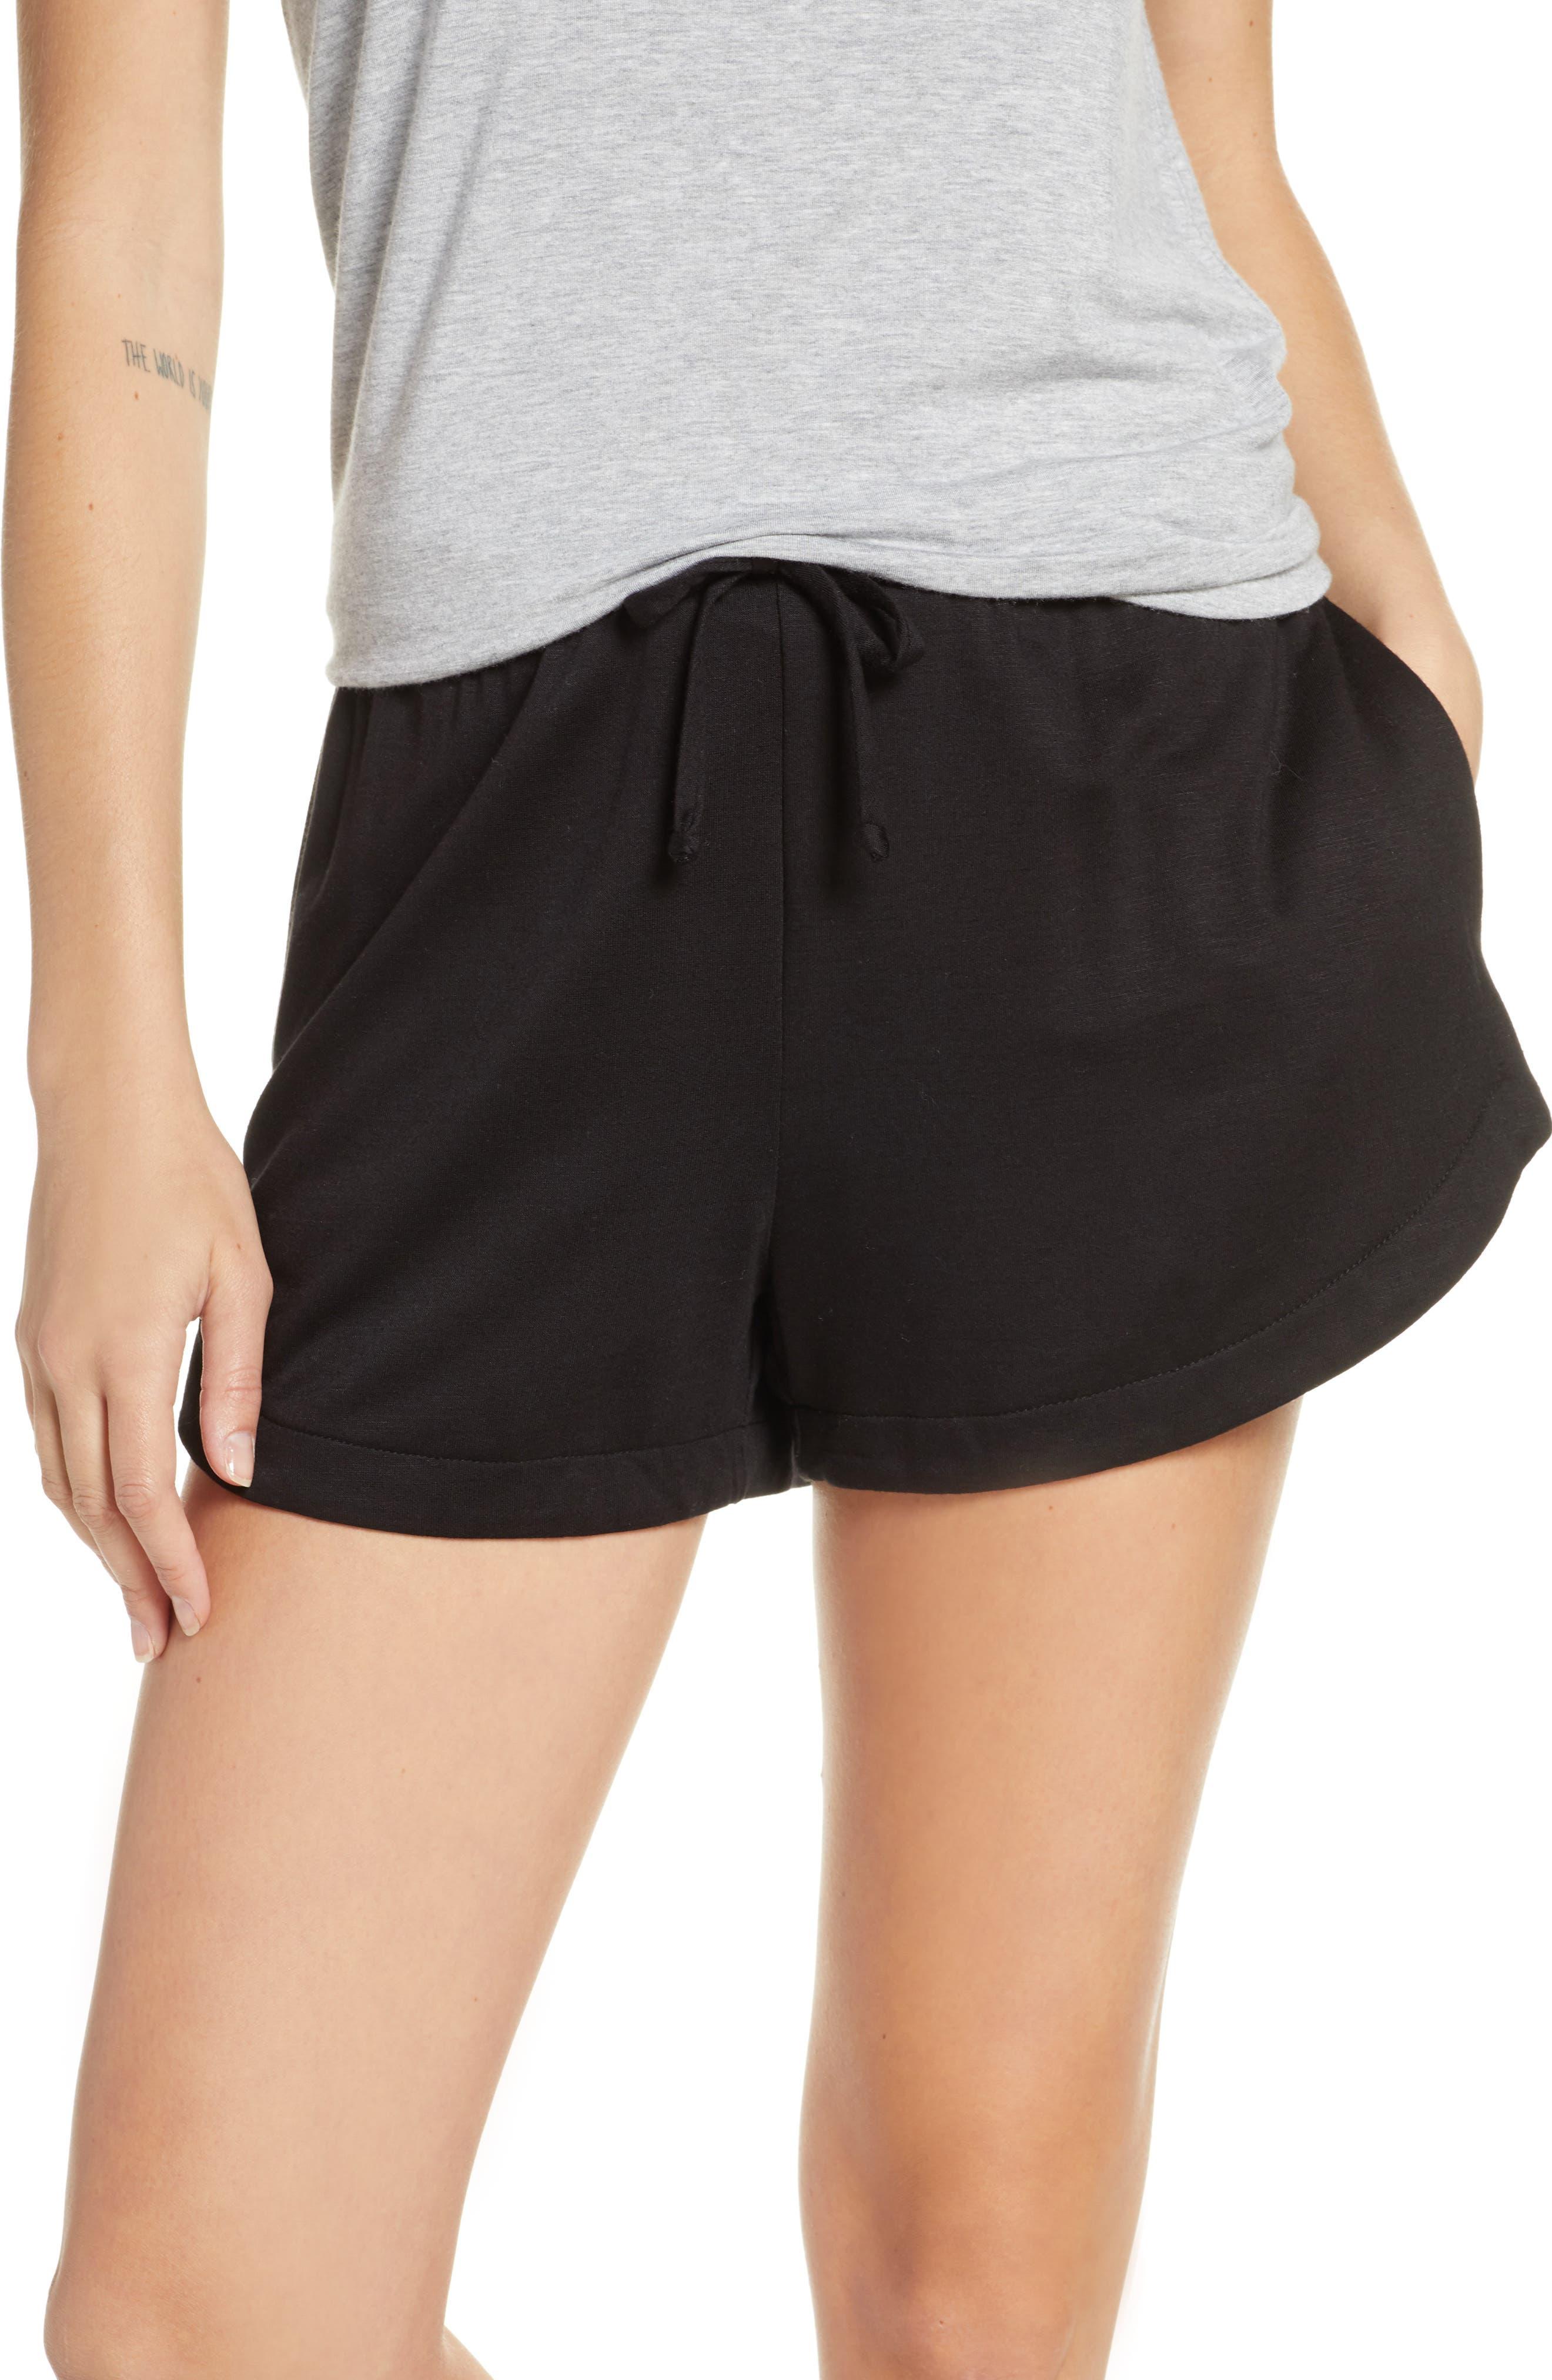 Socialite Pajama Shorts, Black